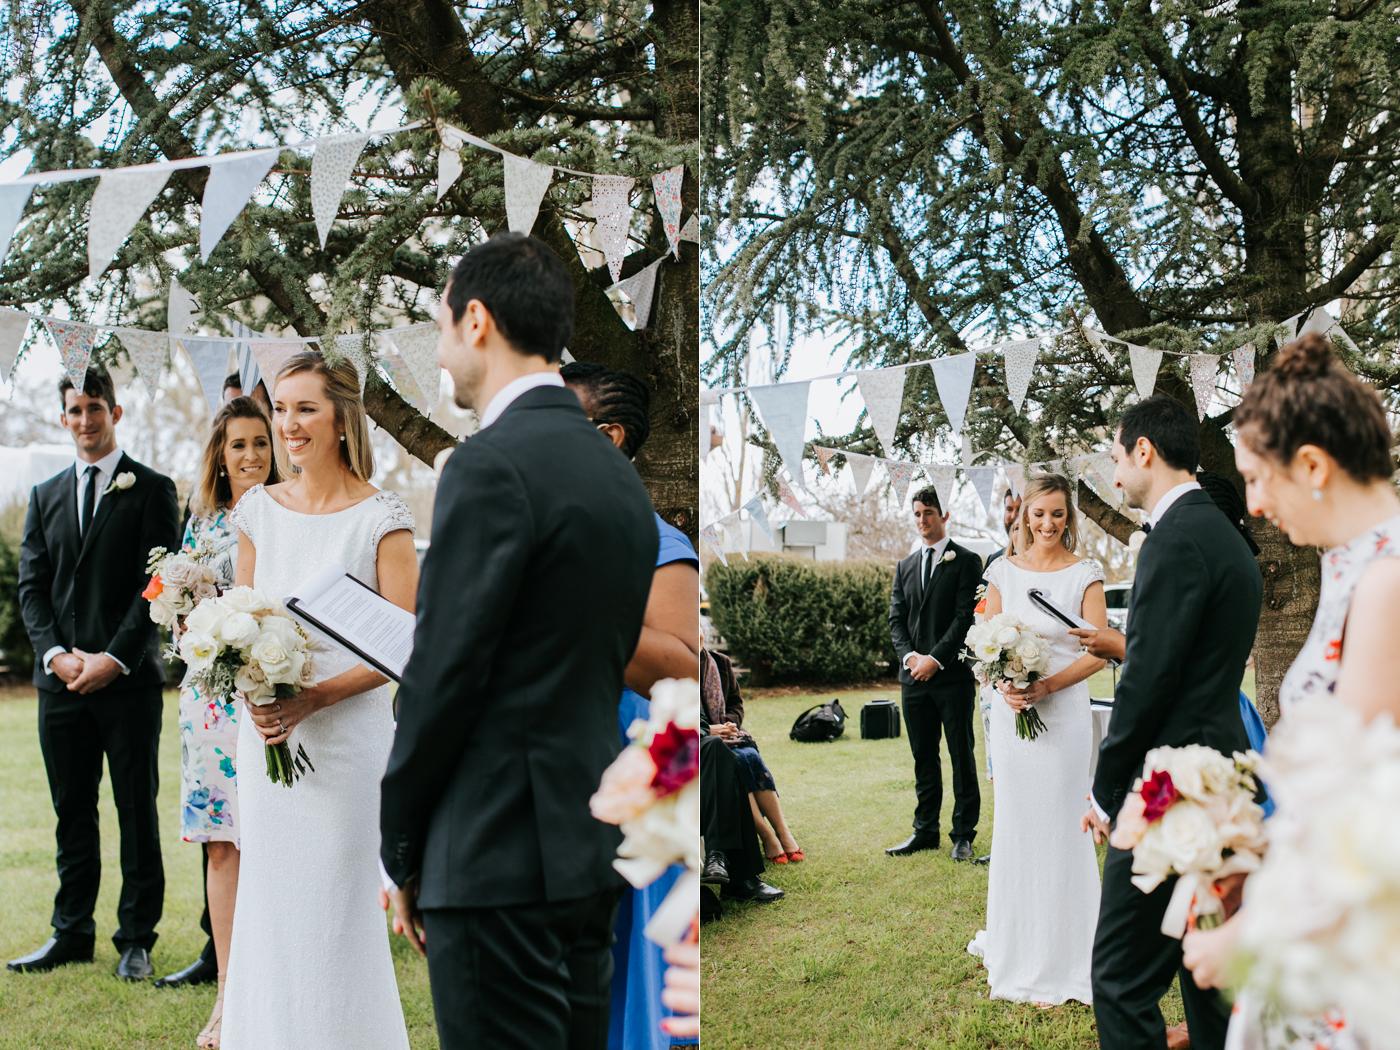 Bridget & James - Orange Country Wedding - Samantha Heather Photography-37.jpg